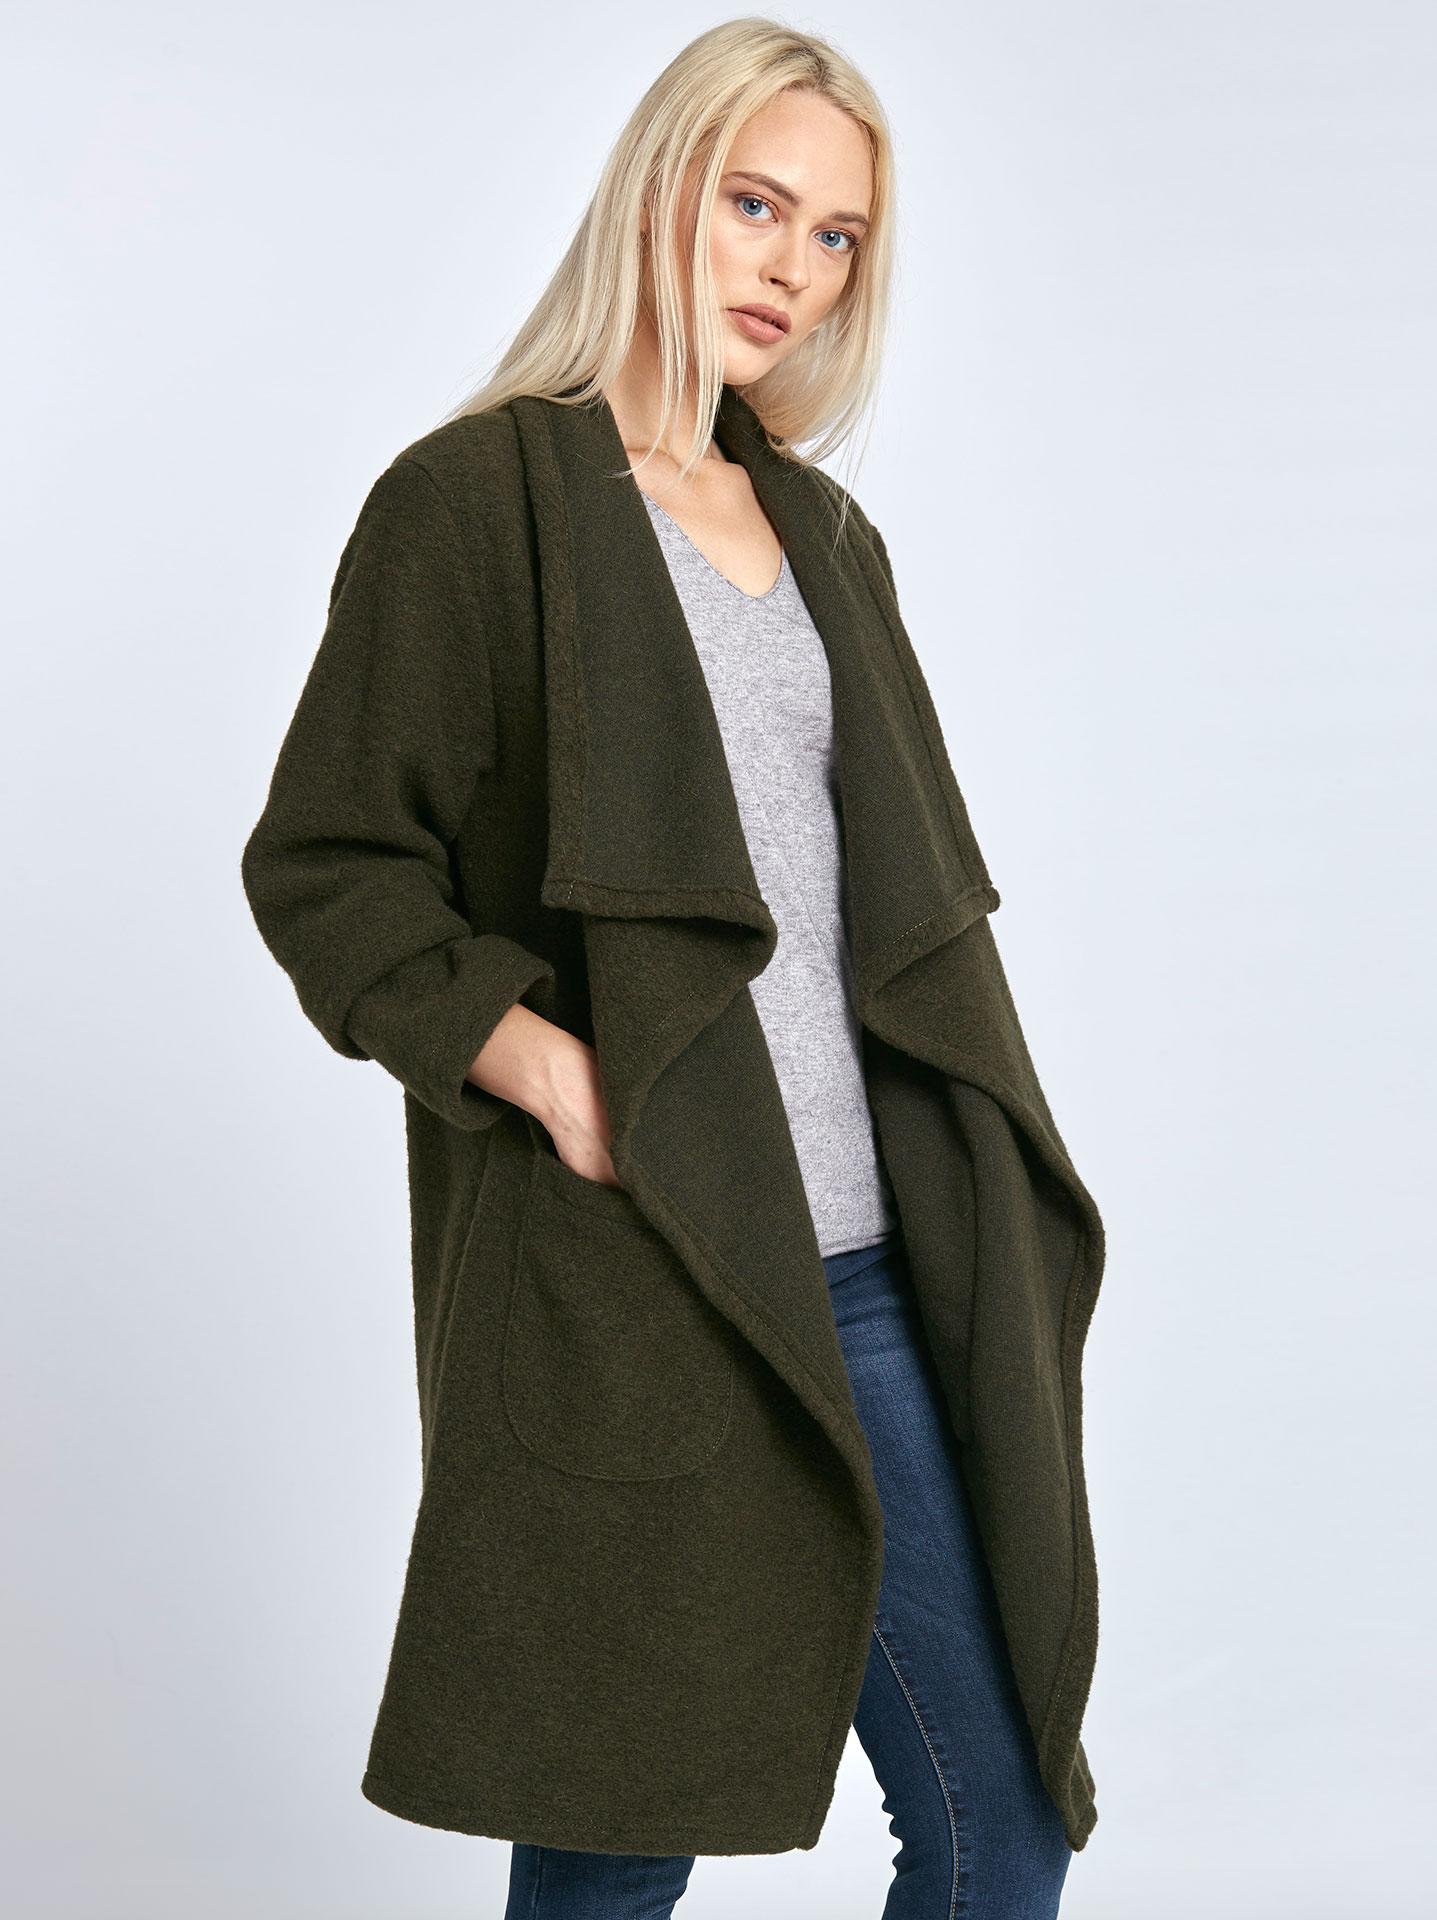 38c66526022f Μπουκλέ παλτό με τσέπες σε χακι